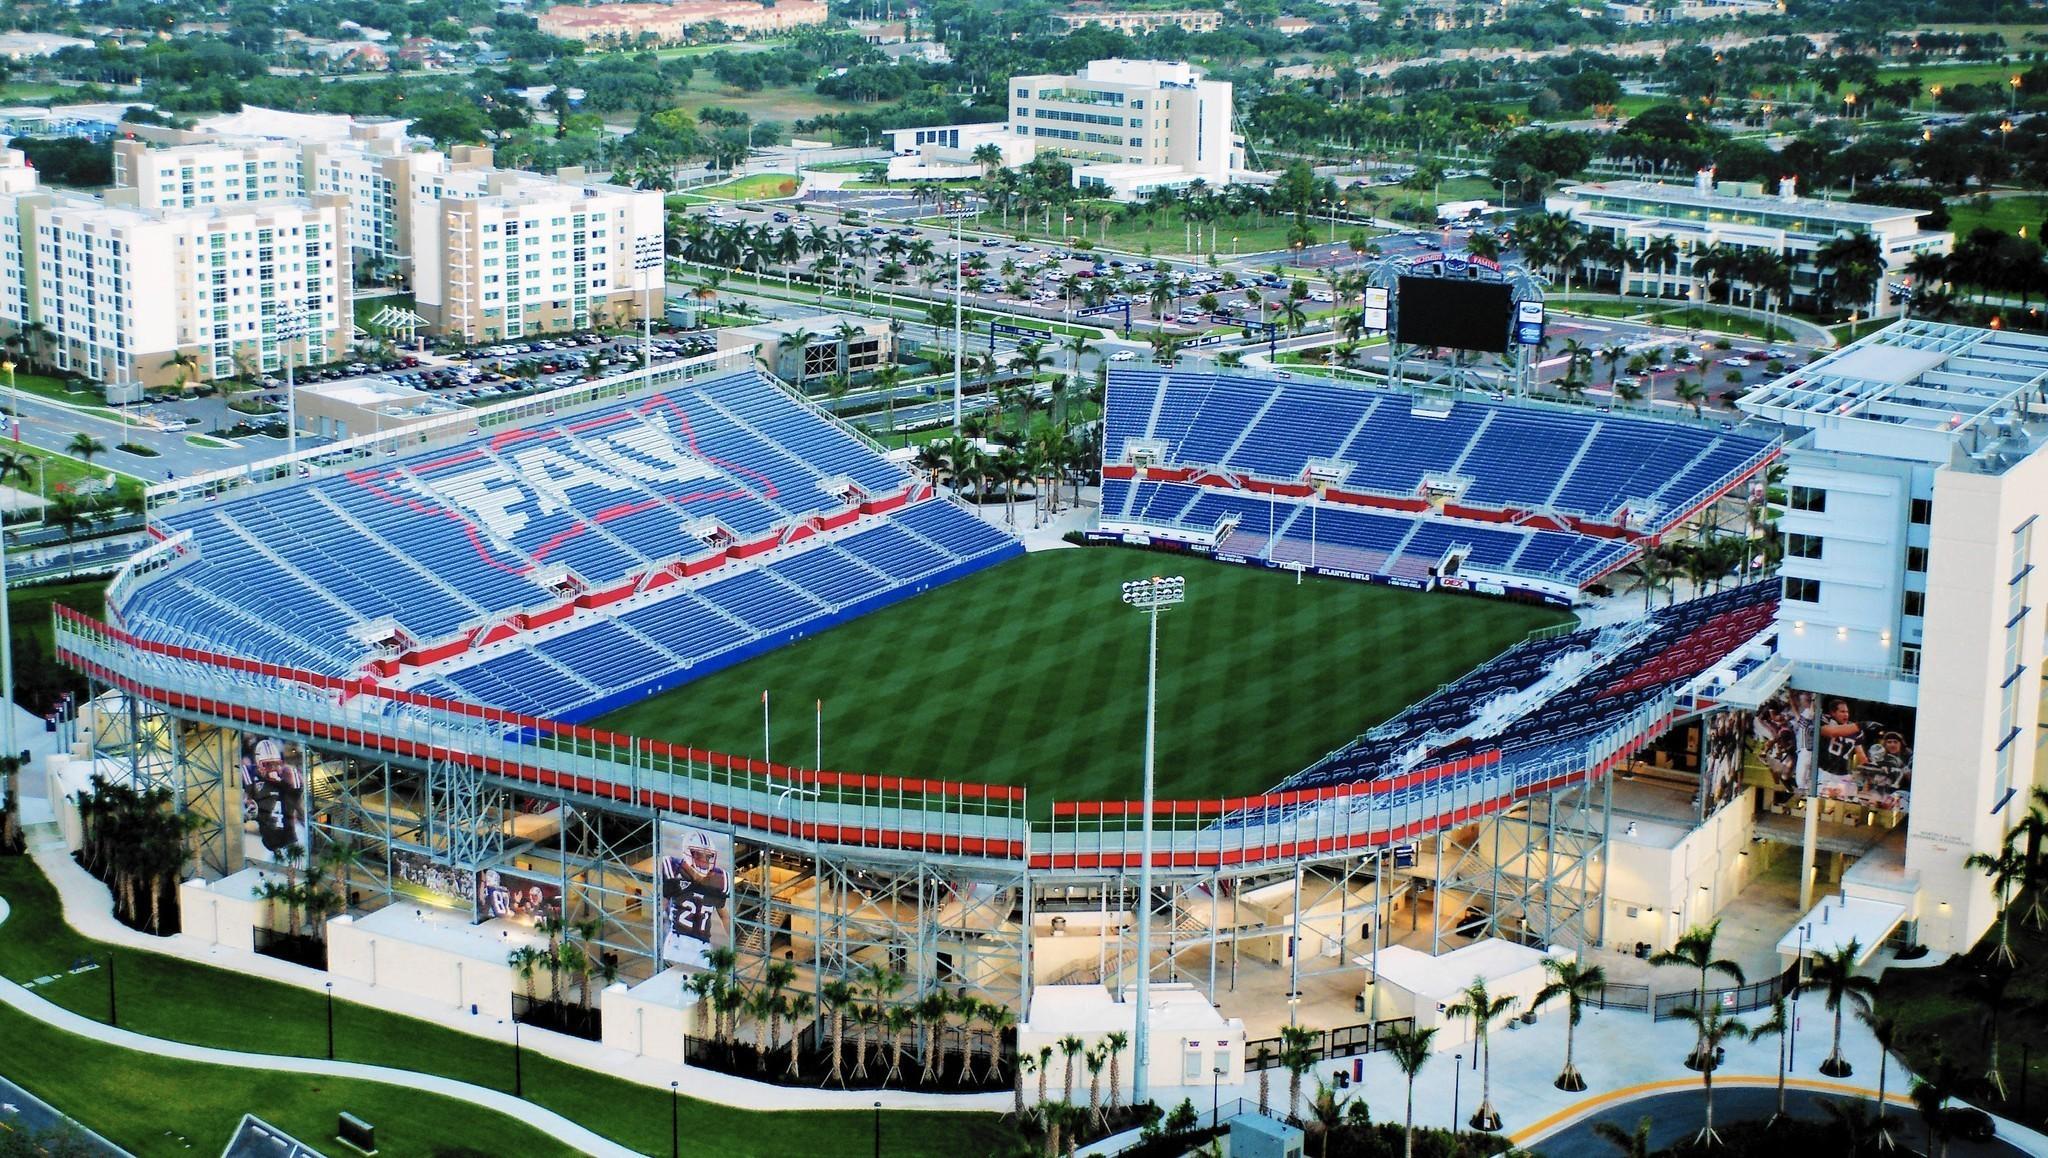 florida atlantic football stadium photos